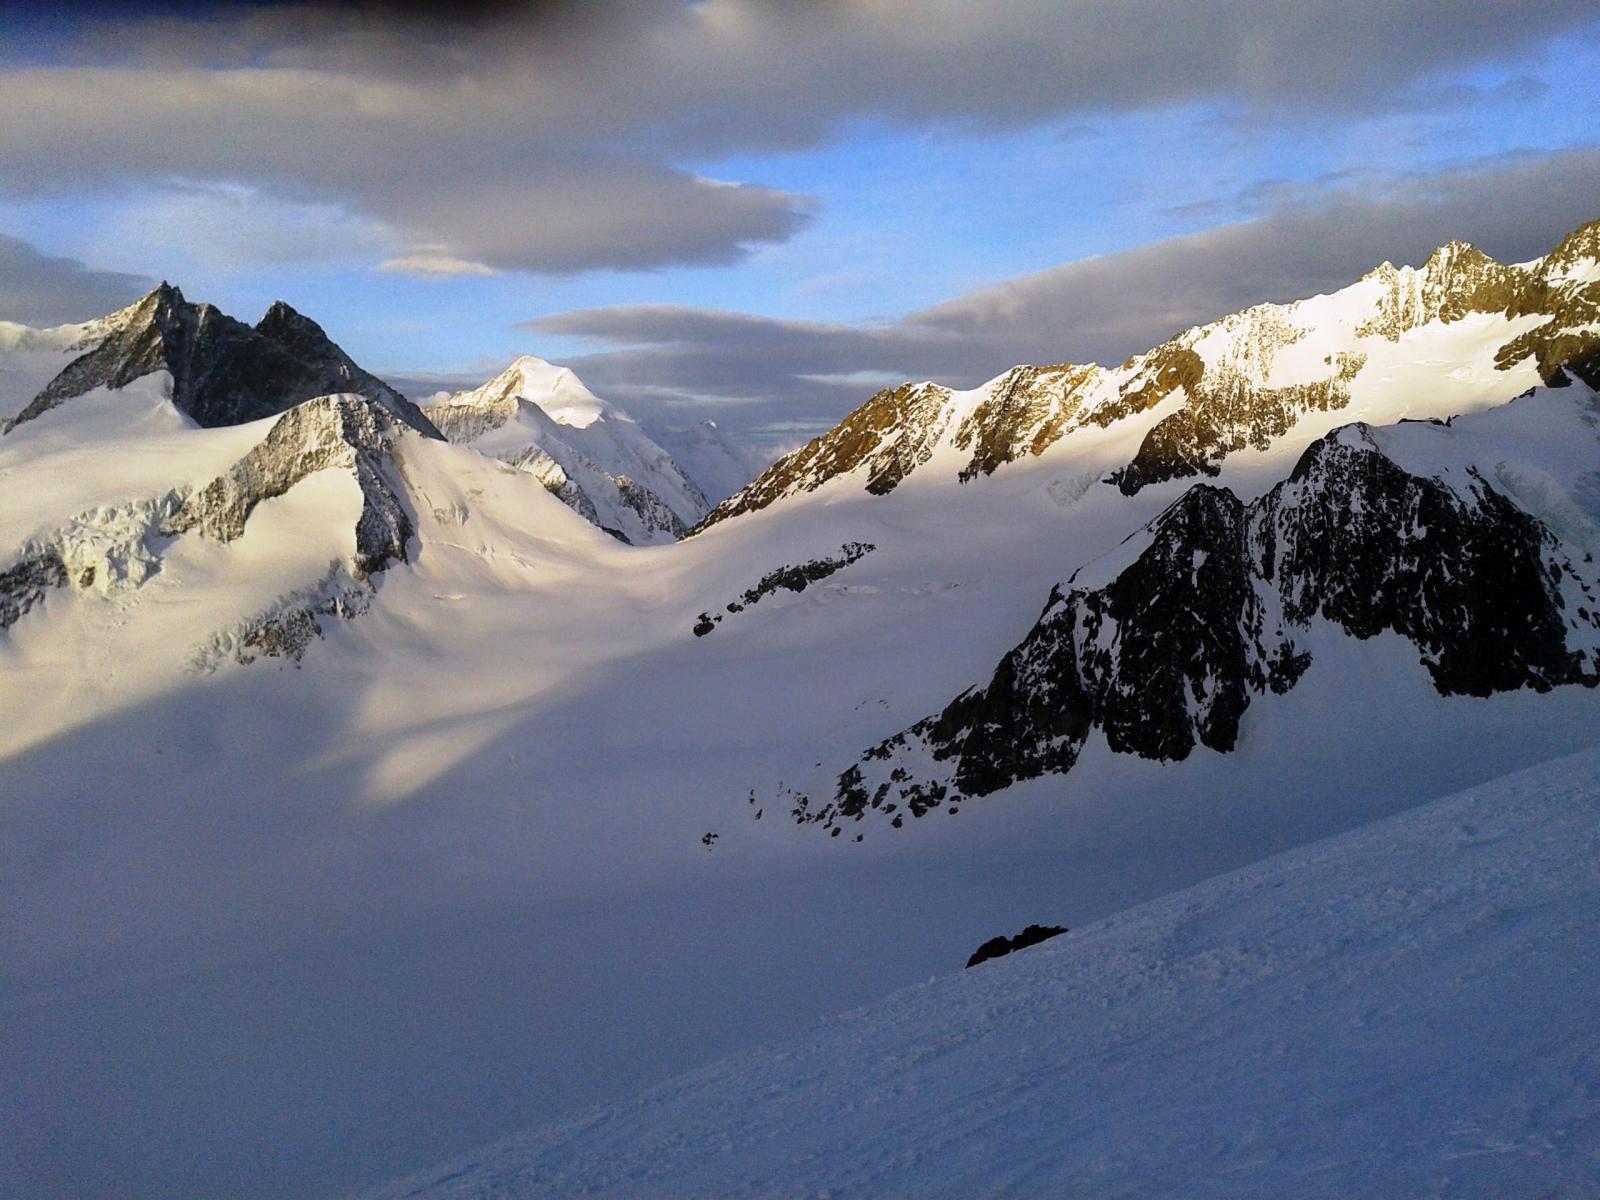 Grunhornluke e Aletschhorn salendo i ripidi pendii del Finsteraarhorn